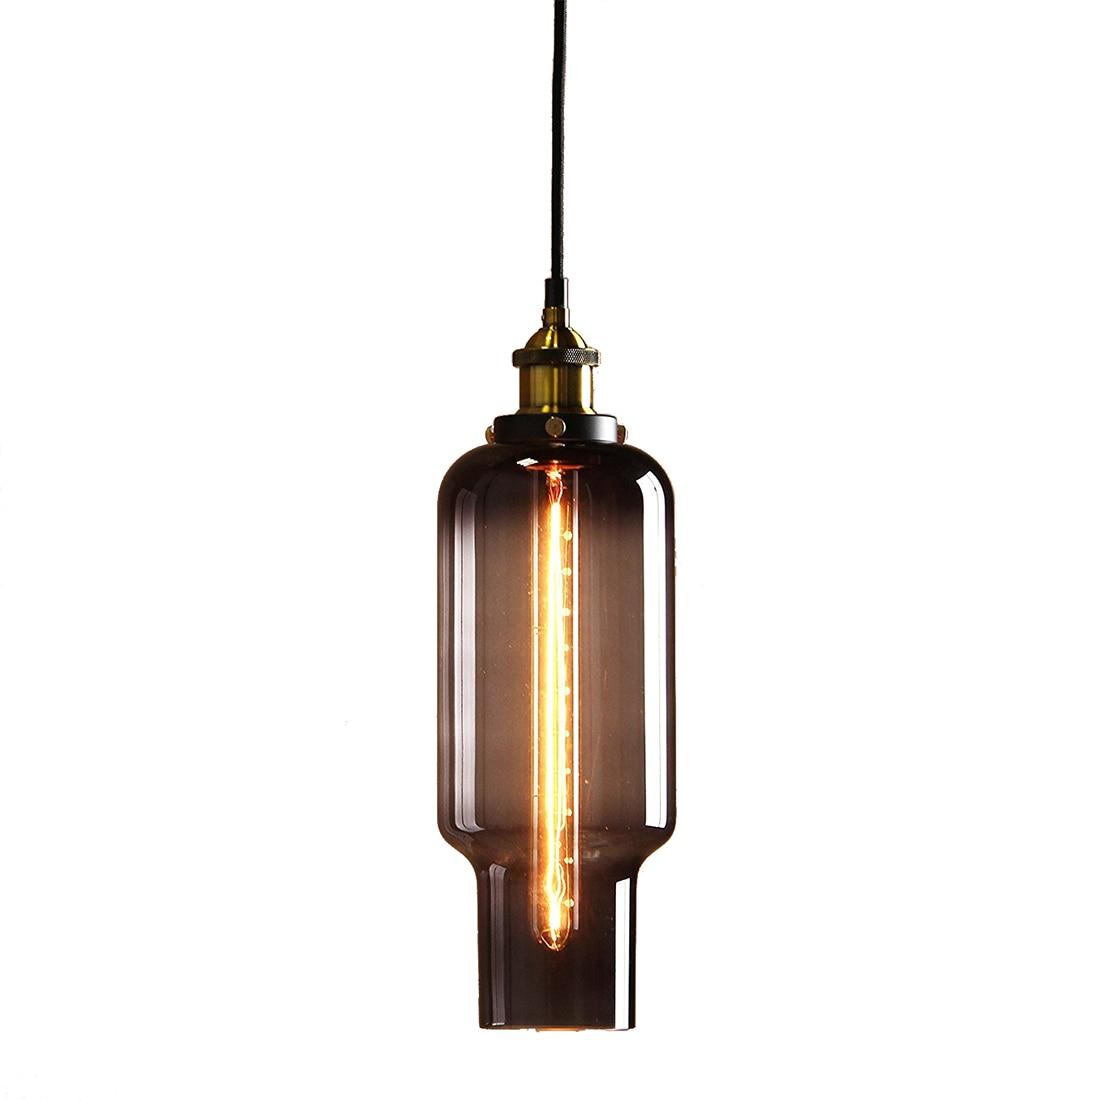 Vintage Industrial Metal Finish Black Gray Glass Shade Loft Pendant Lamp Retro (diameter 14cm Whistle glass shade Brass head)<br>